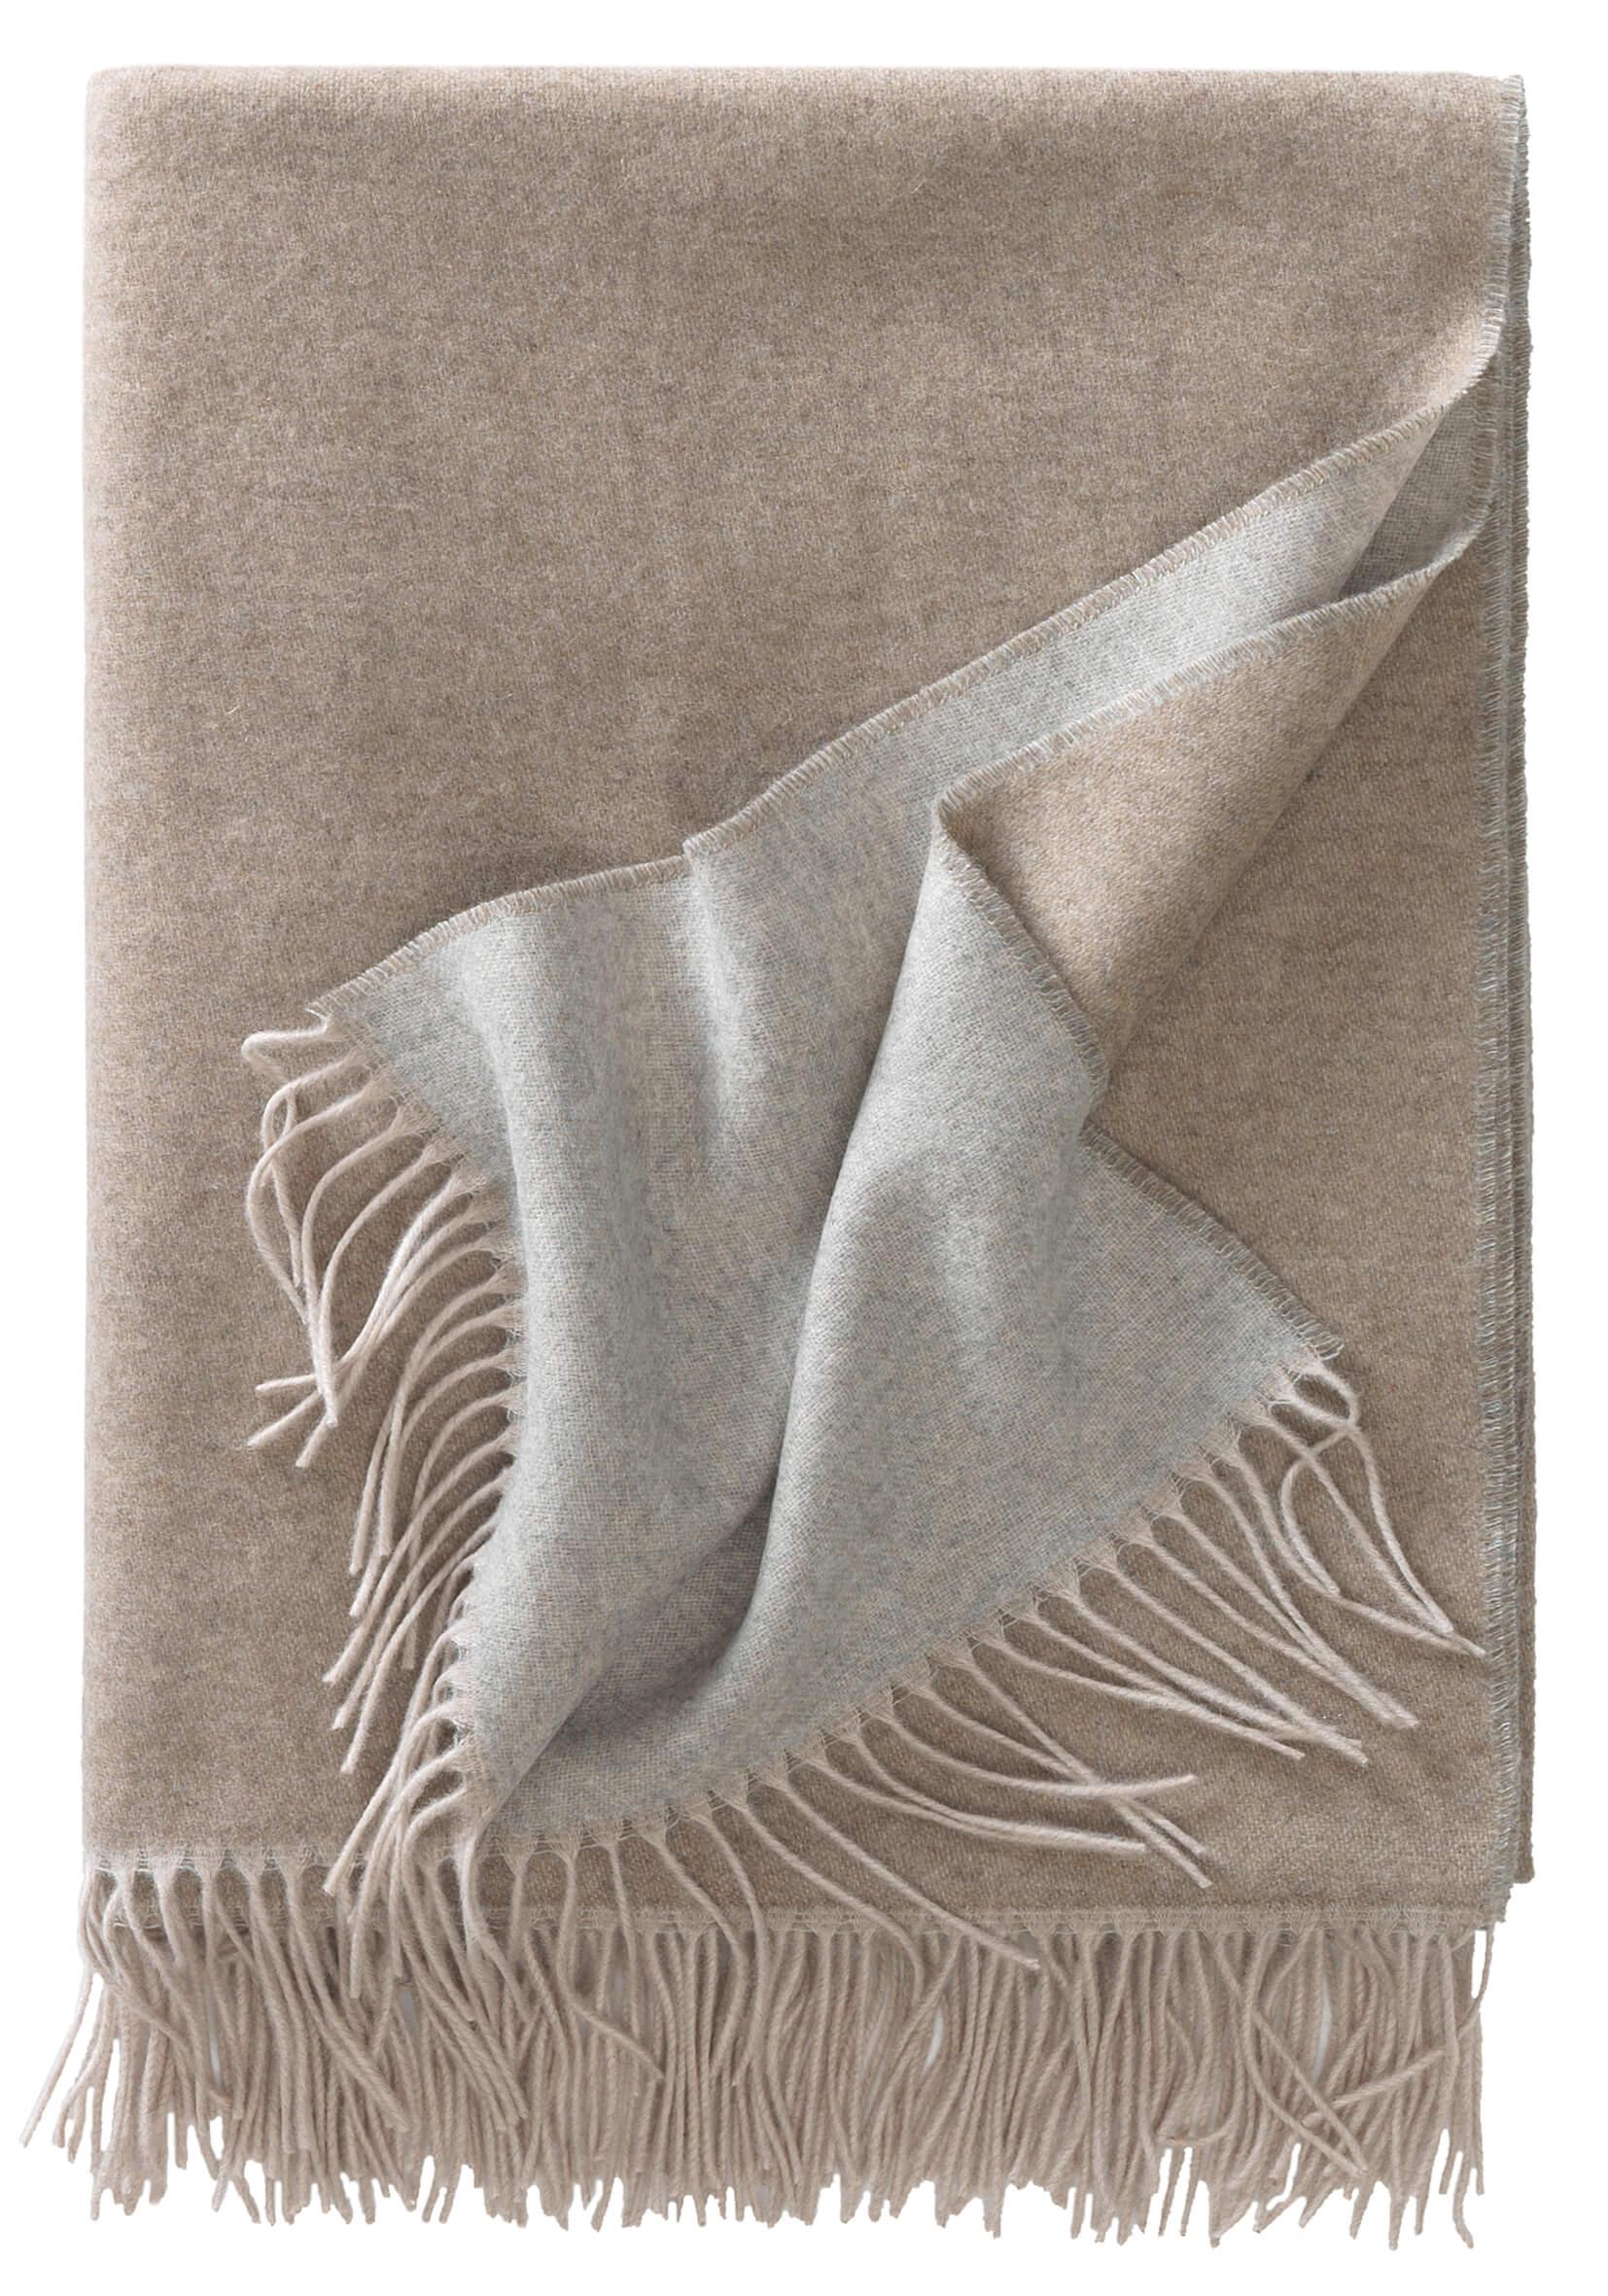 Bild von Alassio116, Variante grau-taupe